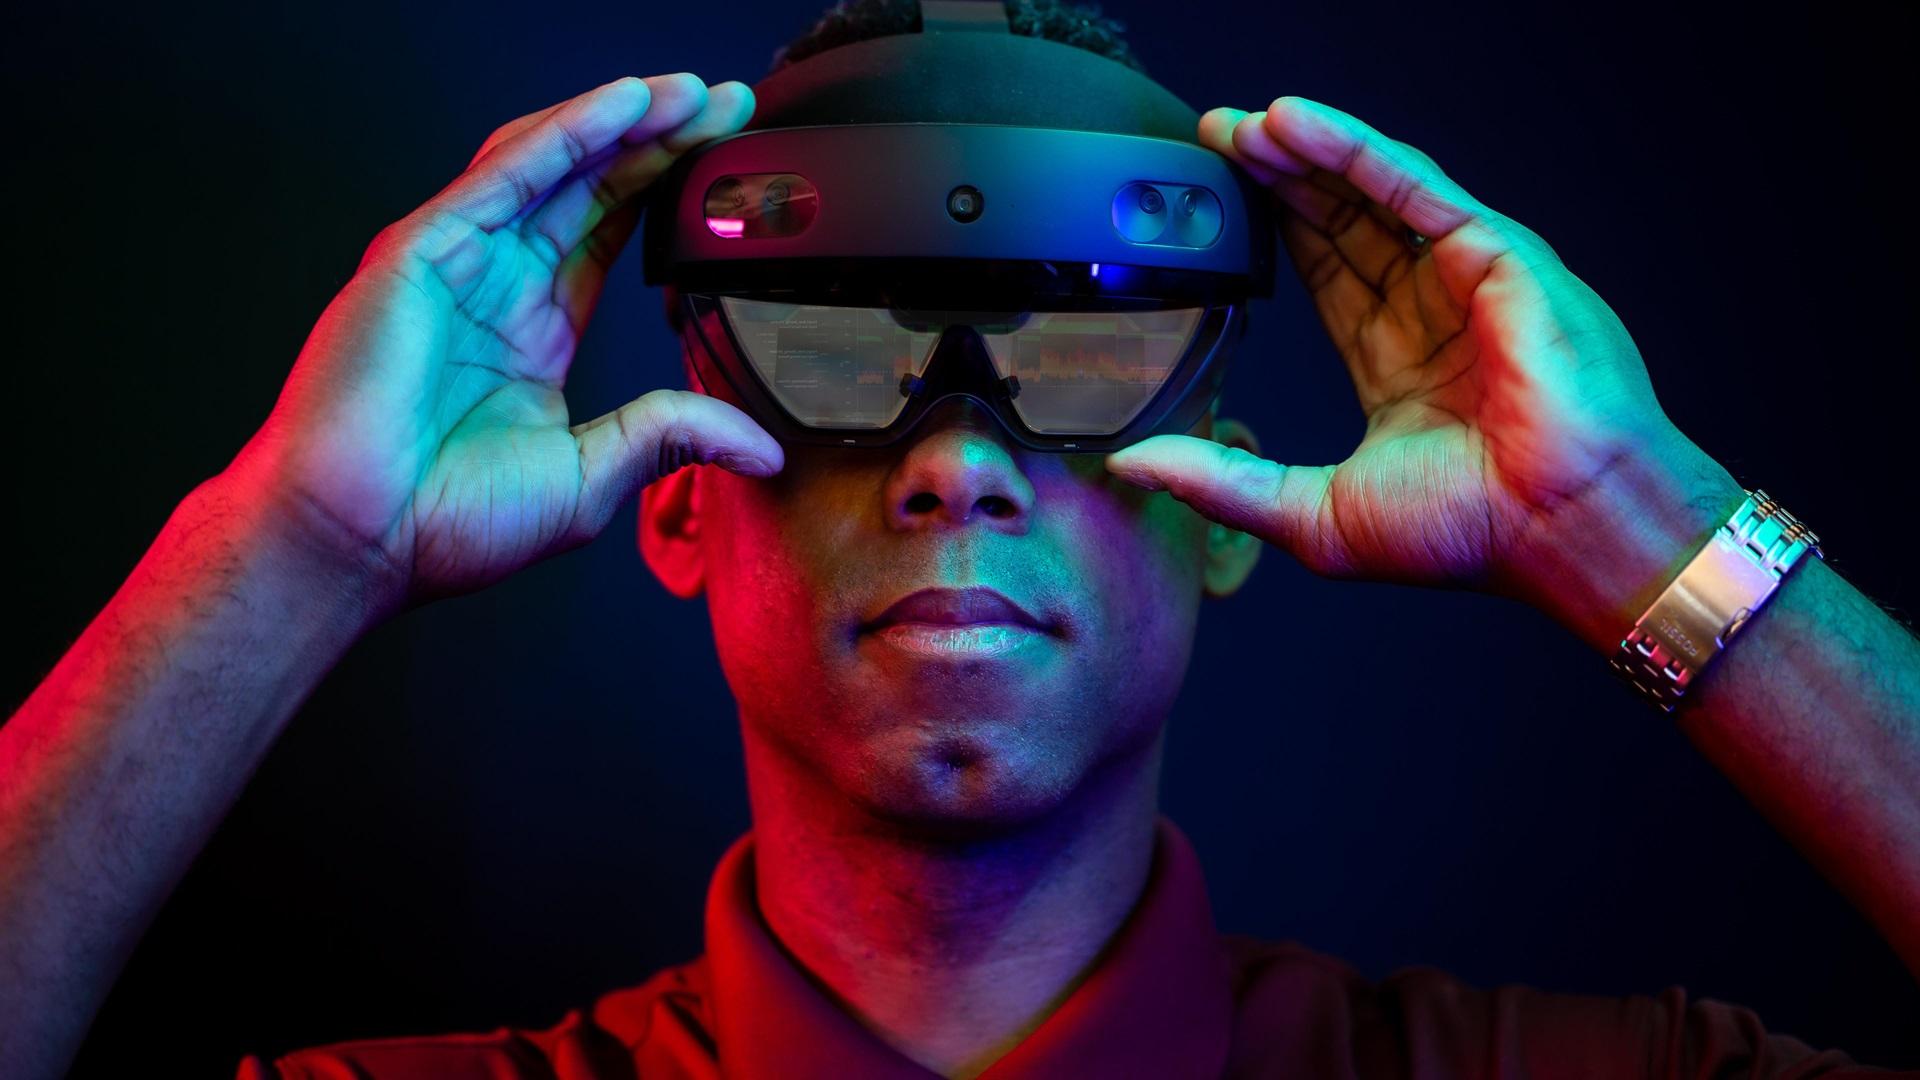 Lifecycl Performance Program HoloLens wearer